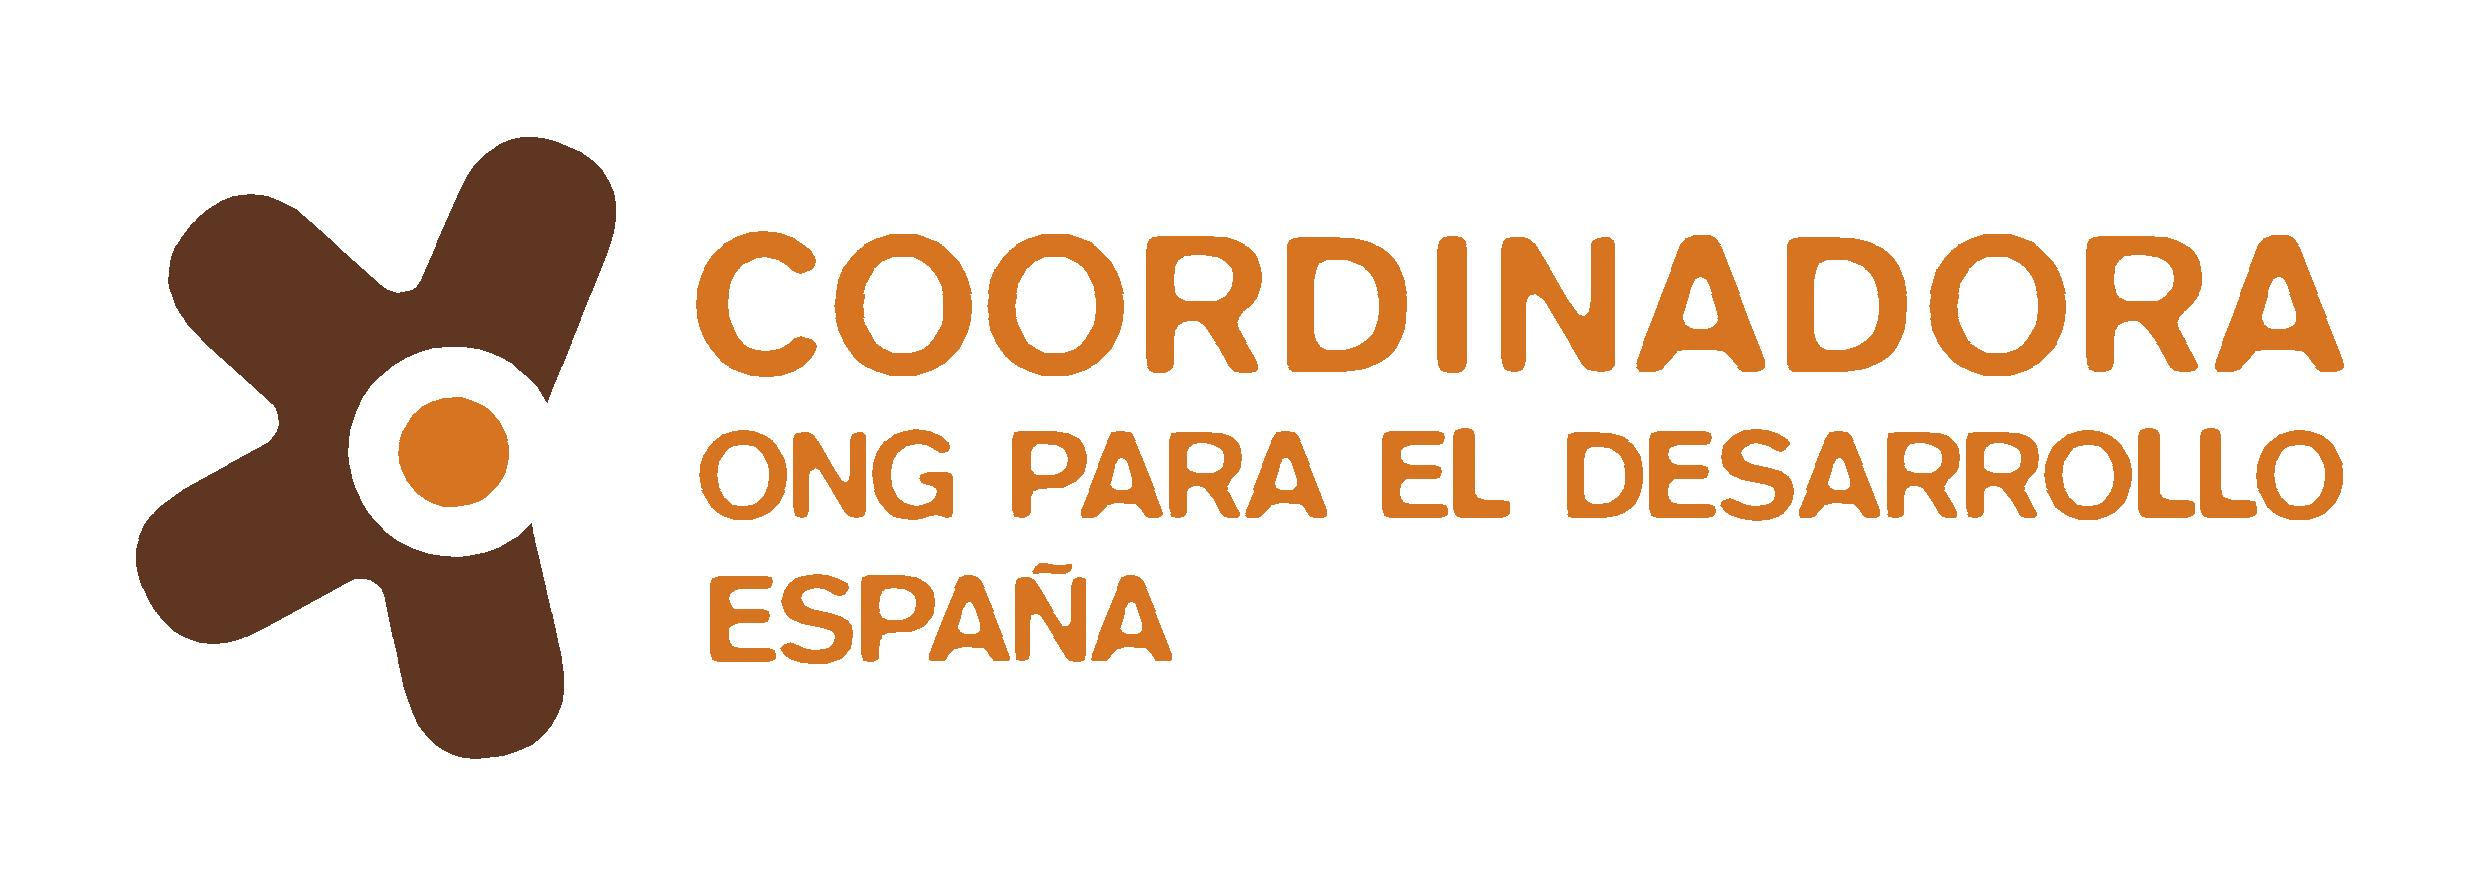 Logotipo de Coordinadora ONGD